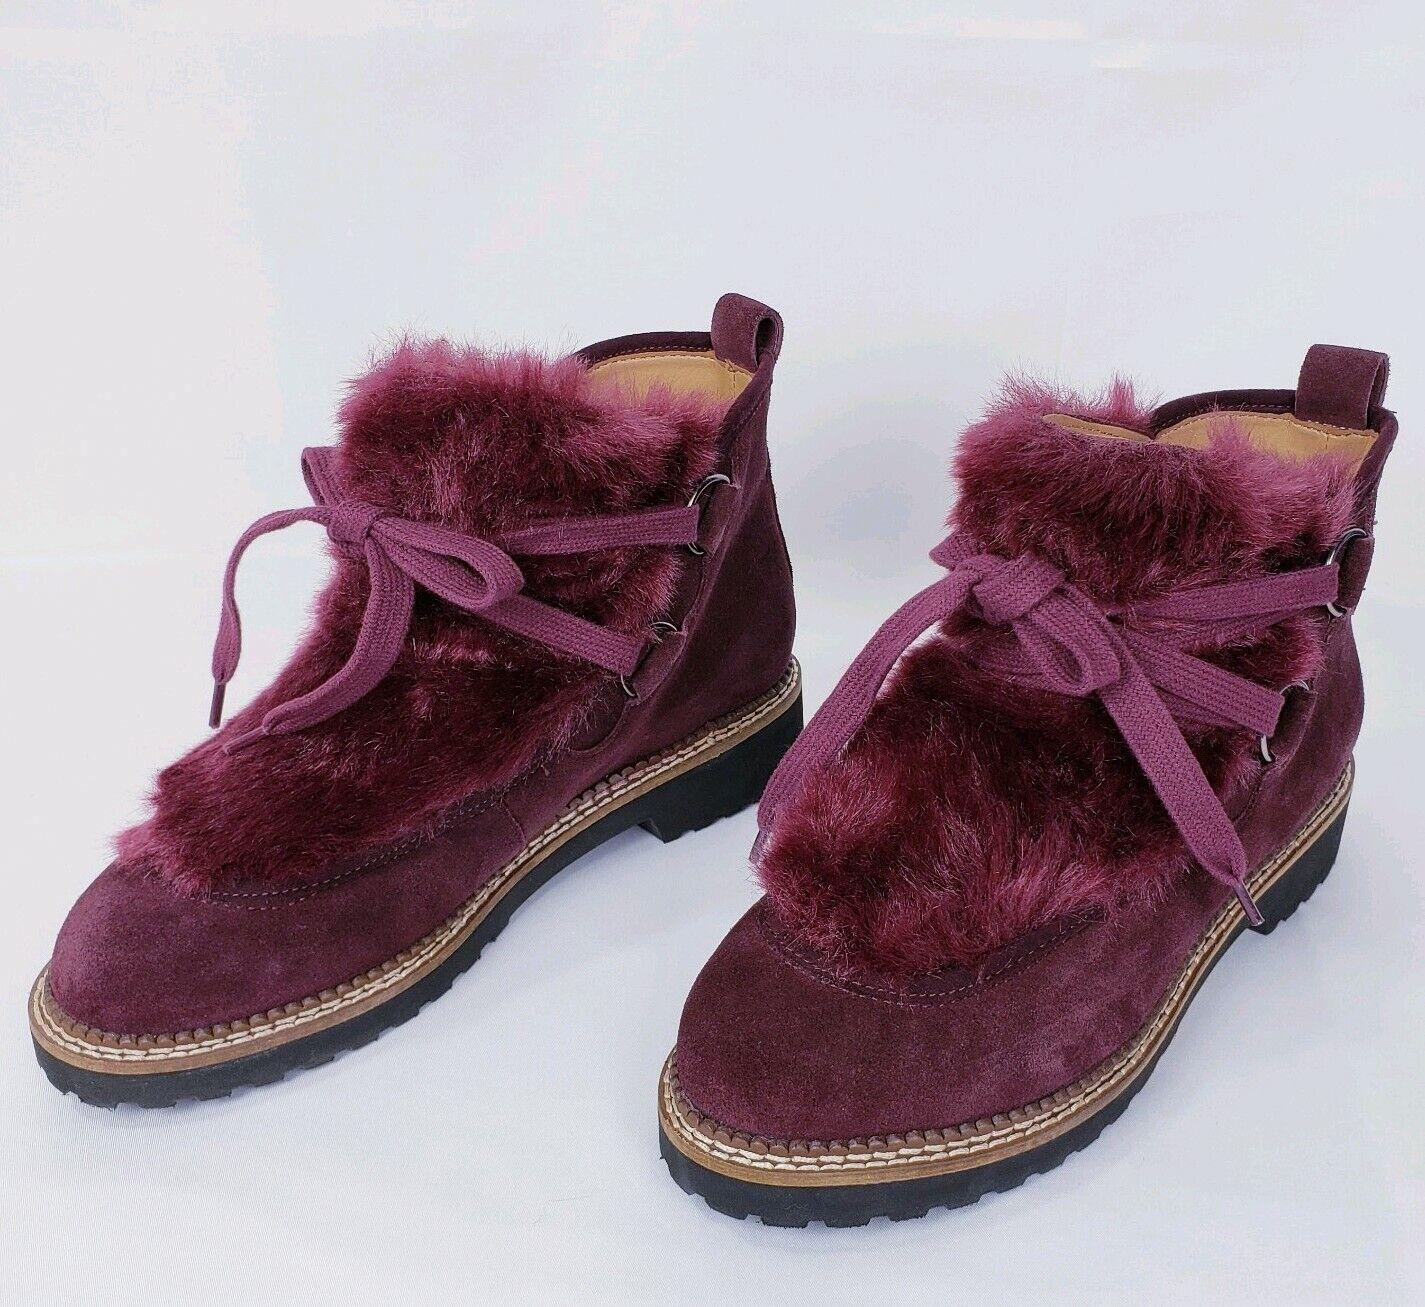 Franco Sarto Highland Brgndy Brgndy Brgndy Faux Fur Trimmed Ankle Boot  Size  7M feb05c